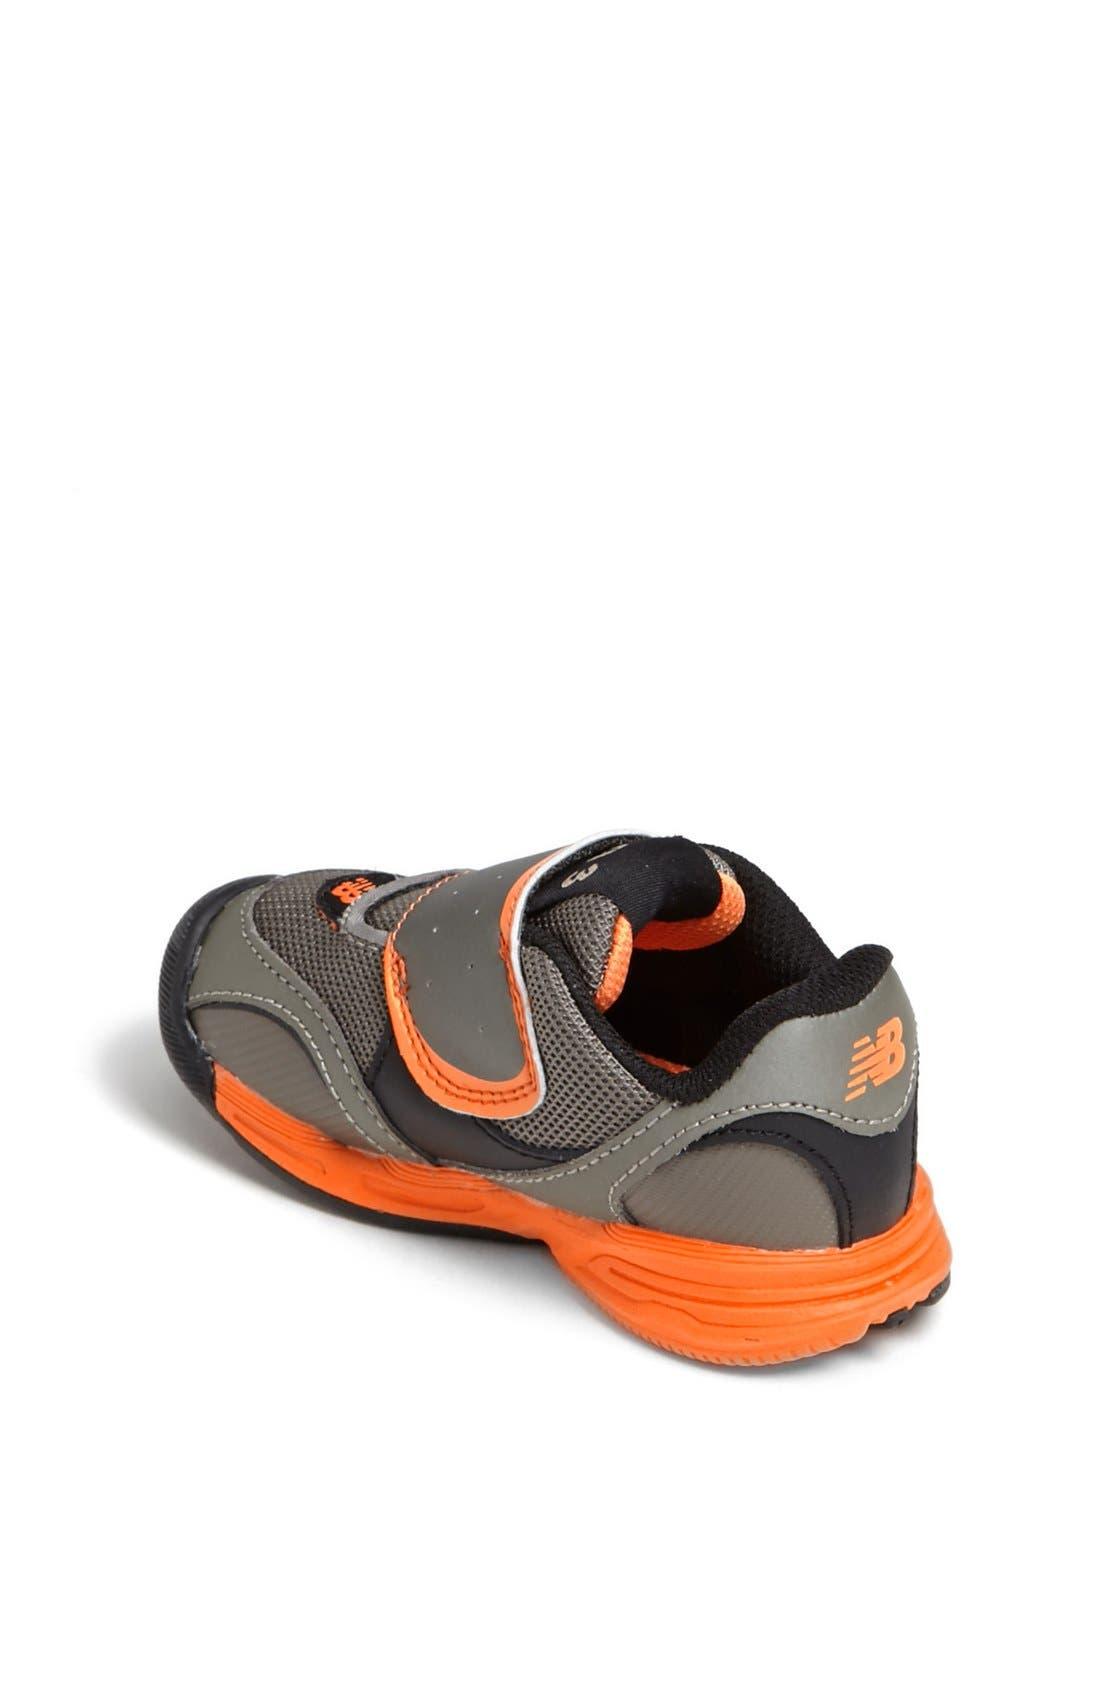 Alternate Image 2  - New Balance '103' Athletic Shoe (Baby, Walker & Toddler)